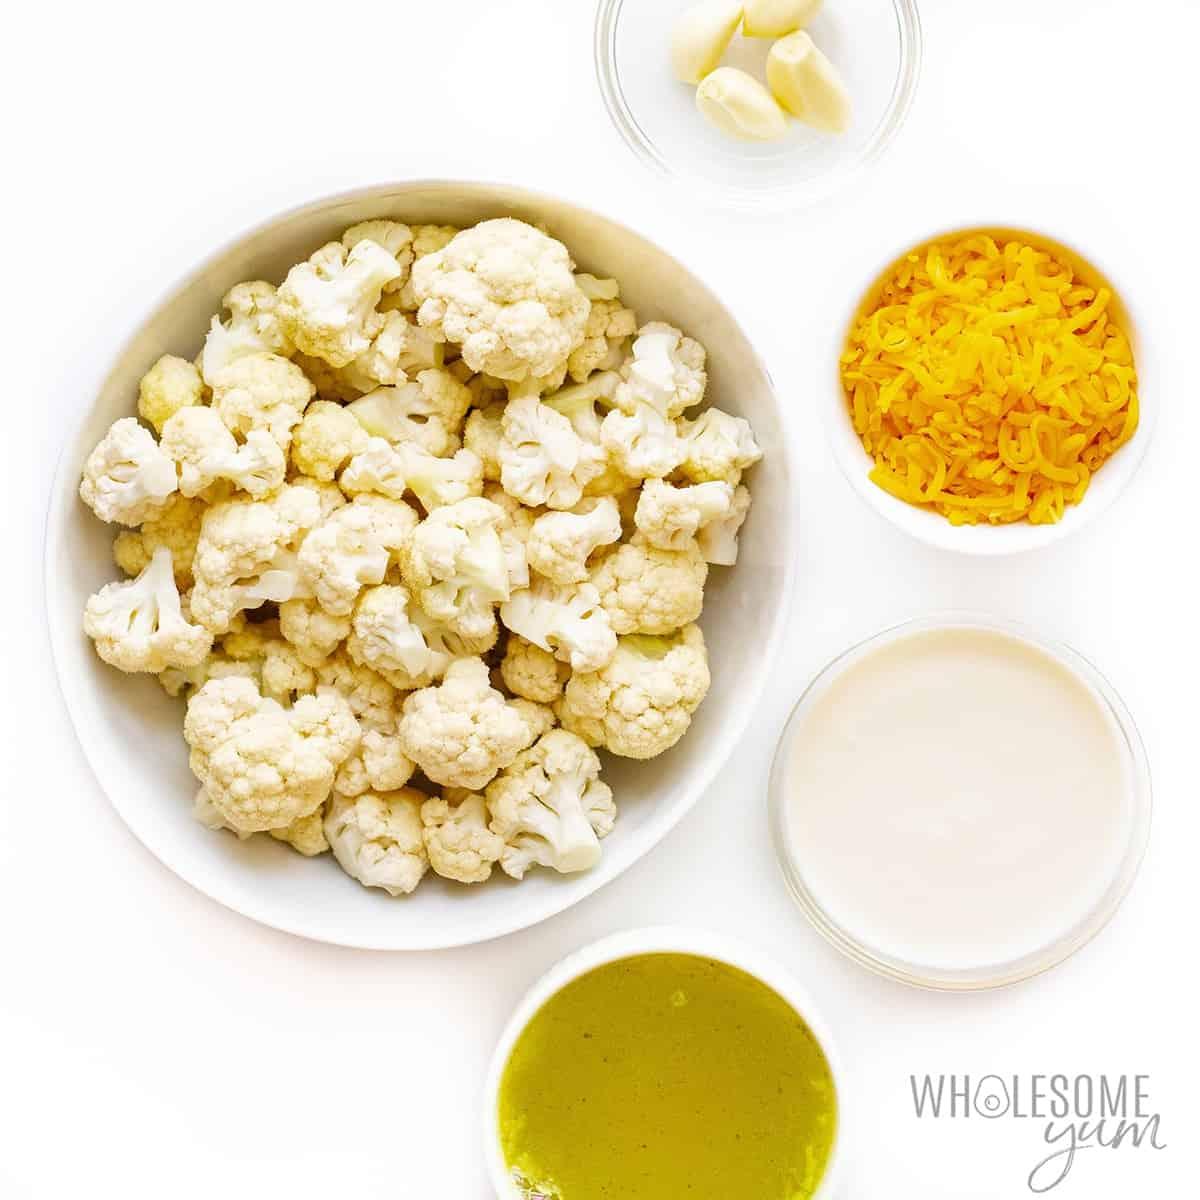 Ingredients to make cheesy cauliflower soup